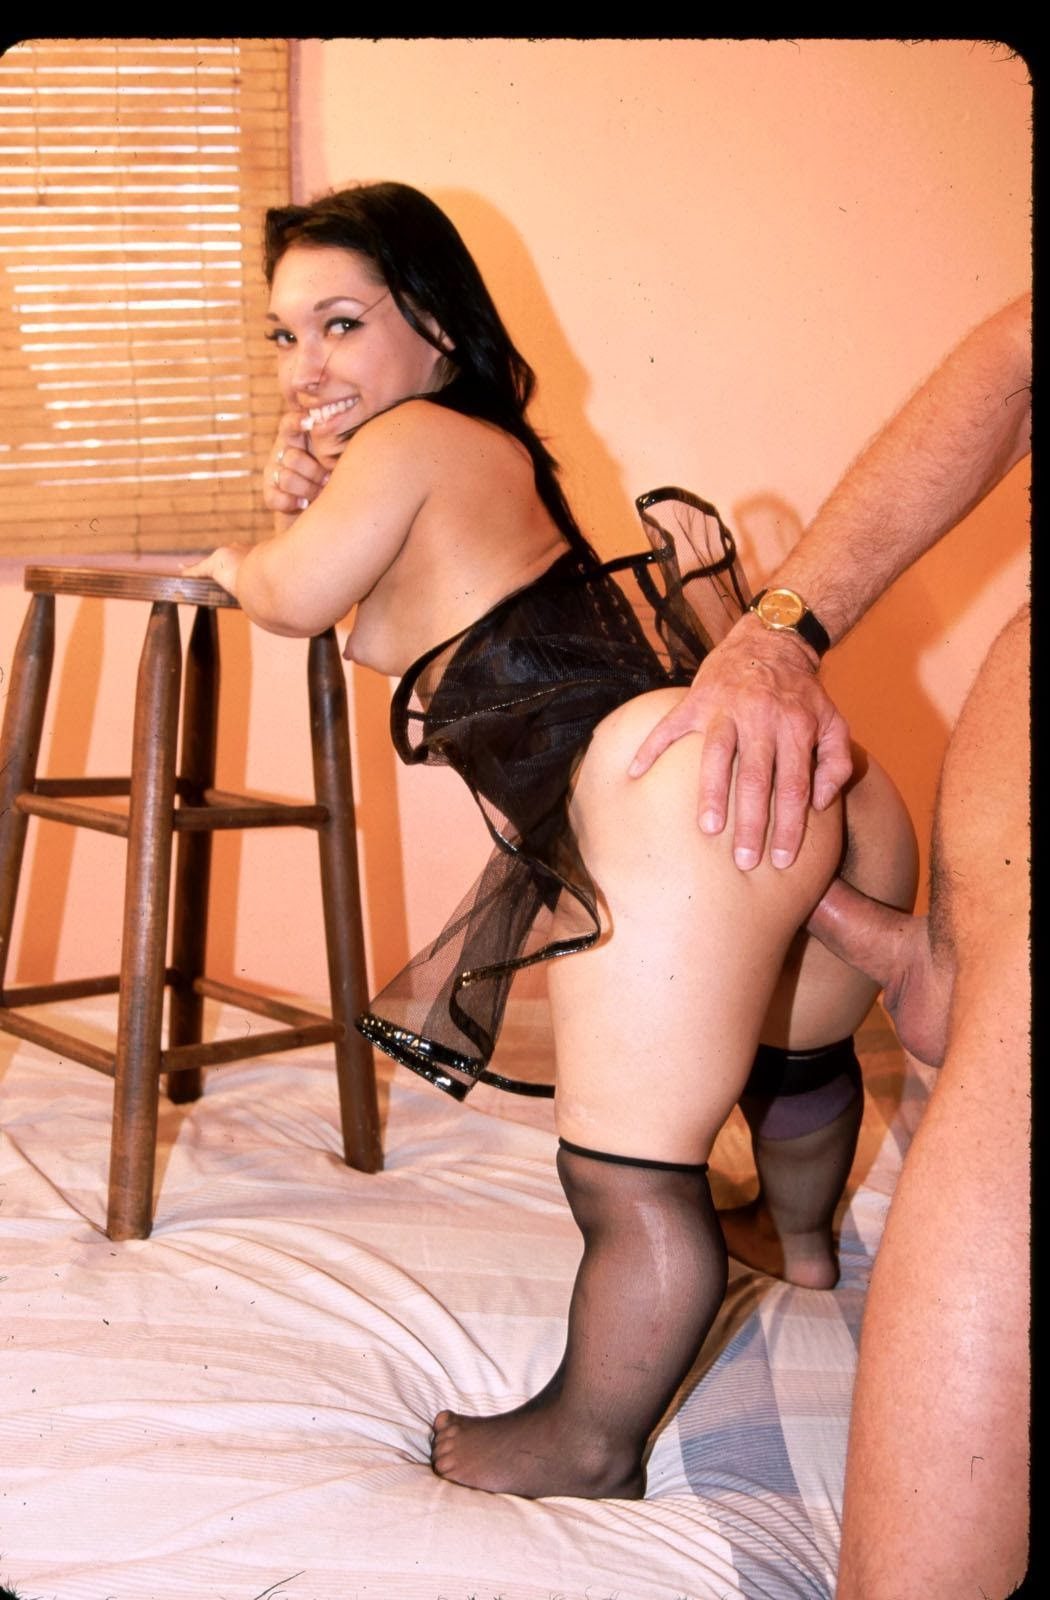 xxx bridgette the midget - porn pics & movies